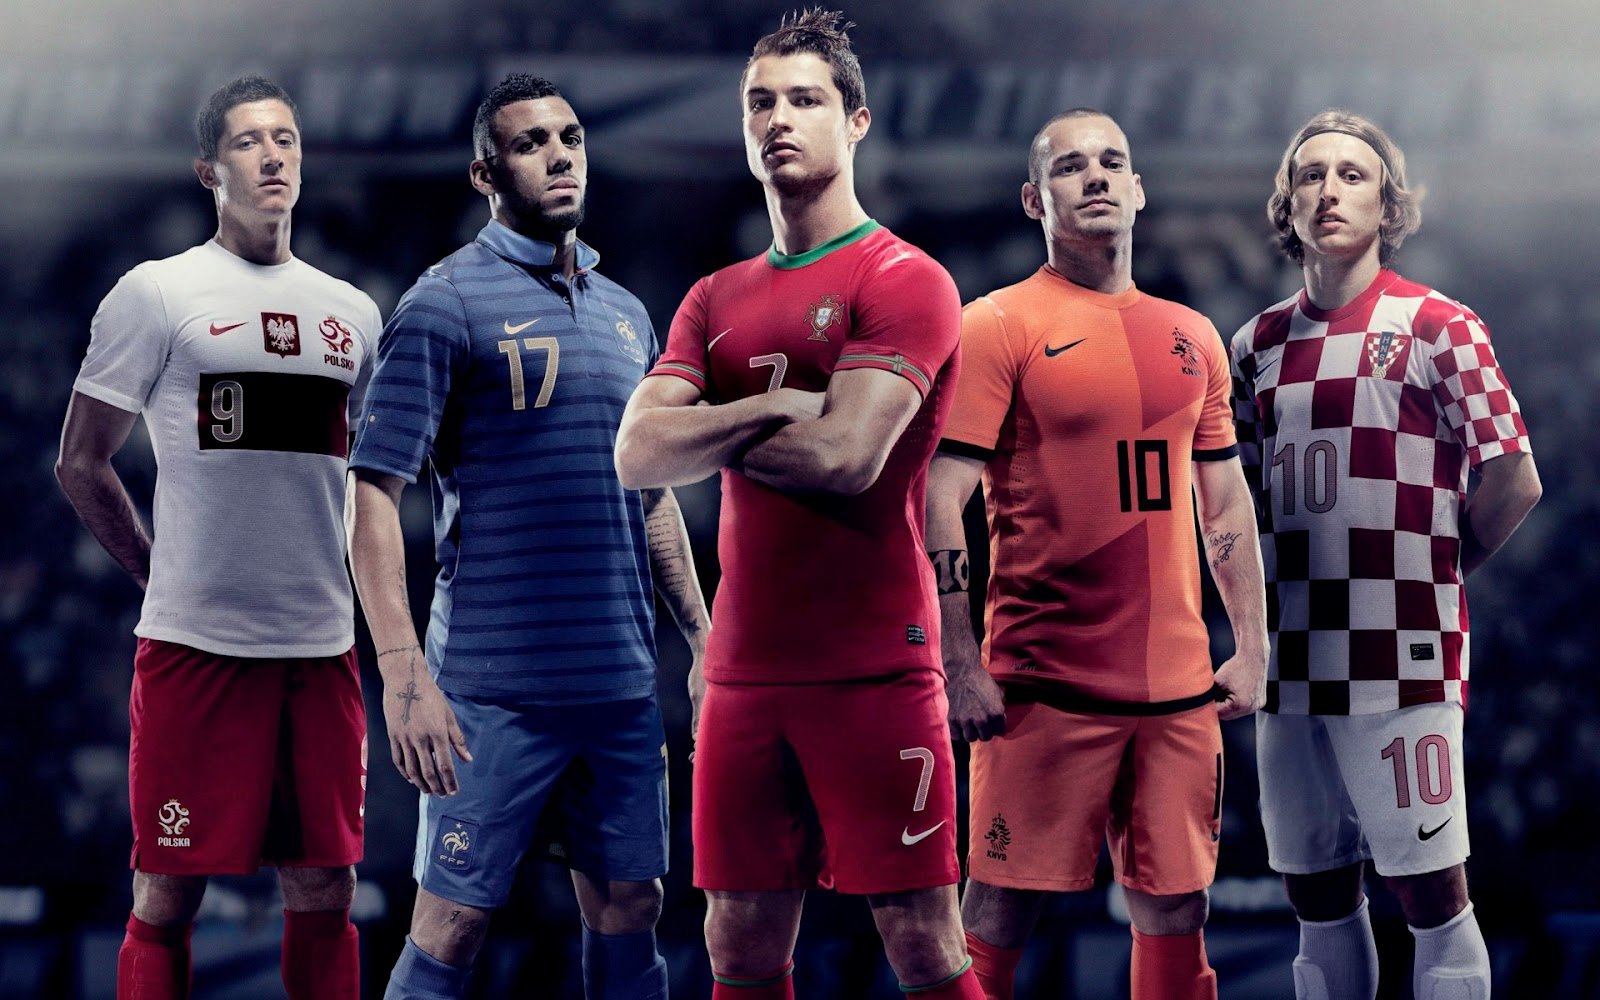 http://3.bp.blogspot.com/-wiaRhyXYrb0/UAEzgZukklI/AAAAAAAAAtw/bQ2Sp7qDs9E/s1600/Euro+2012+Teams+Wide+HD+Wallpaper.jpg